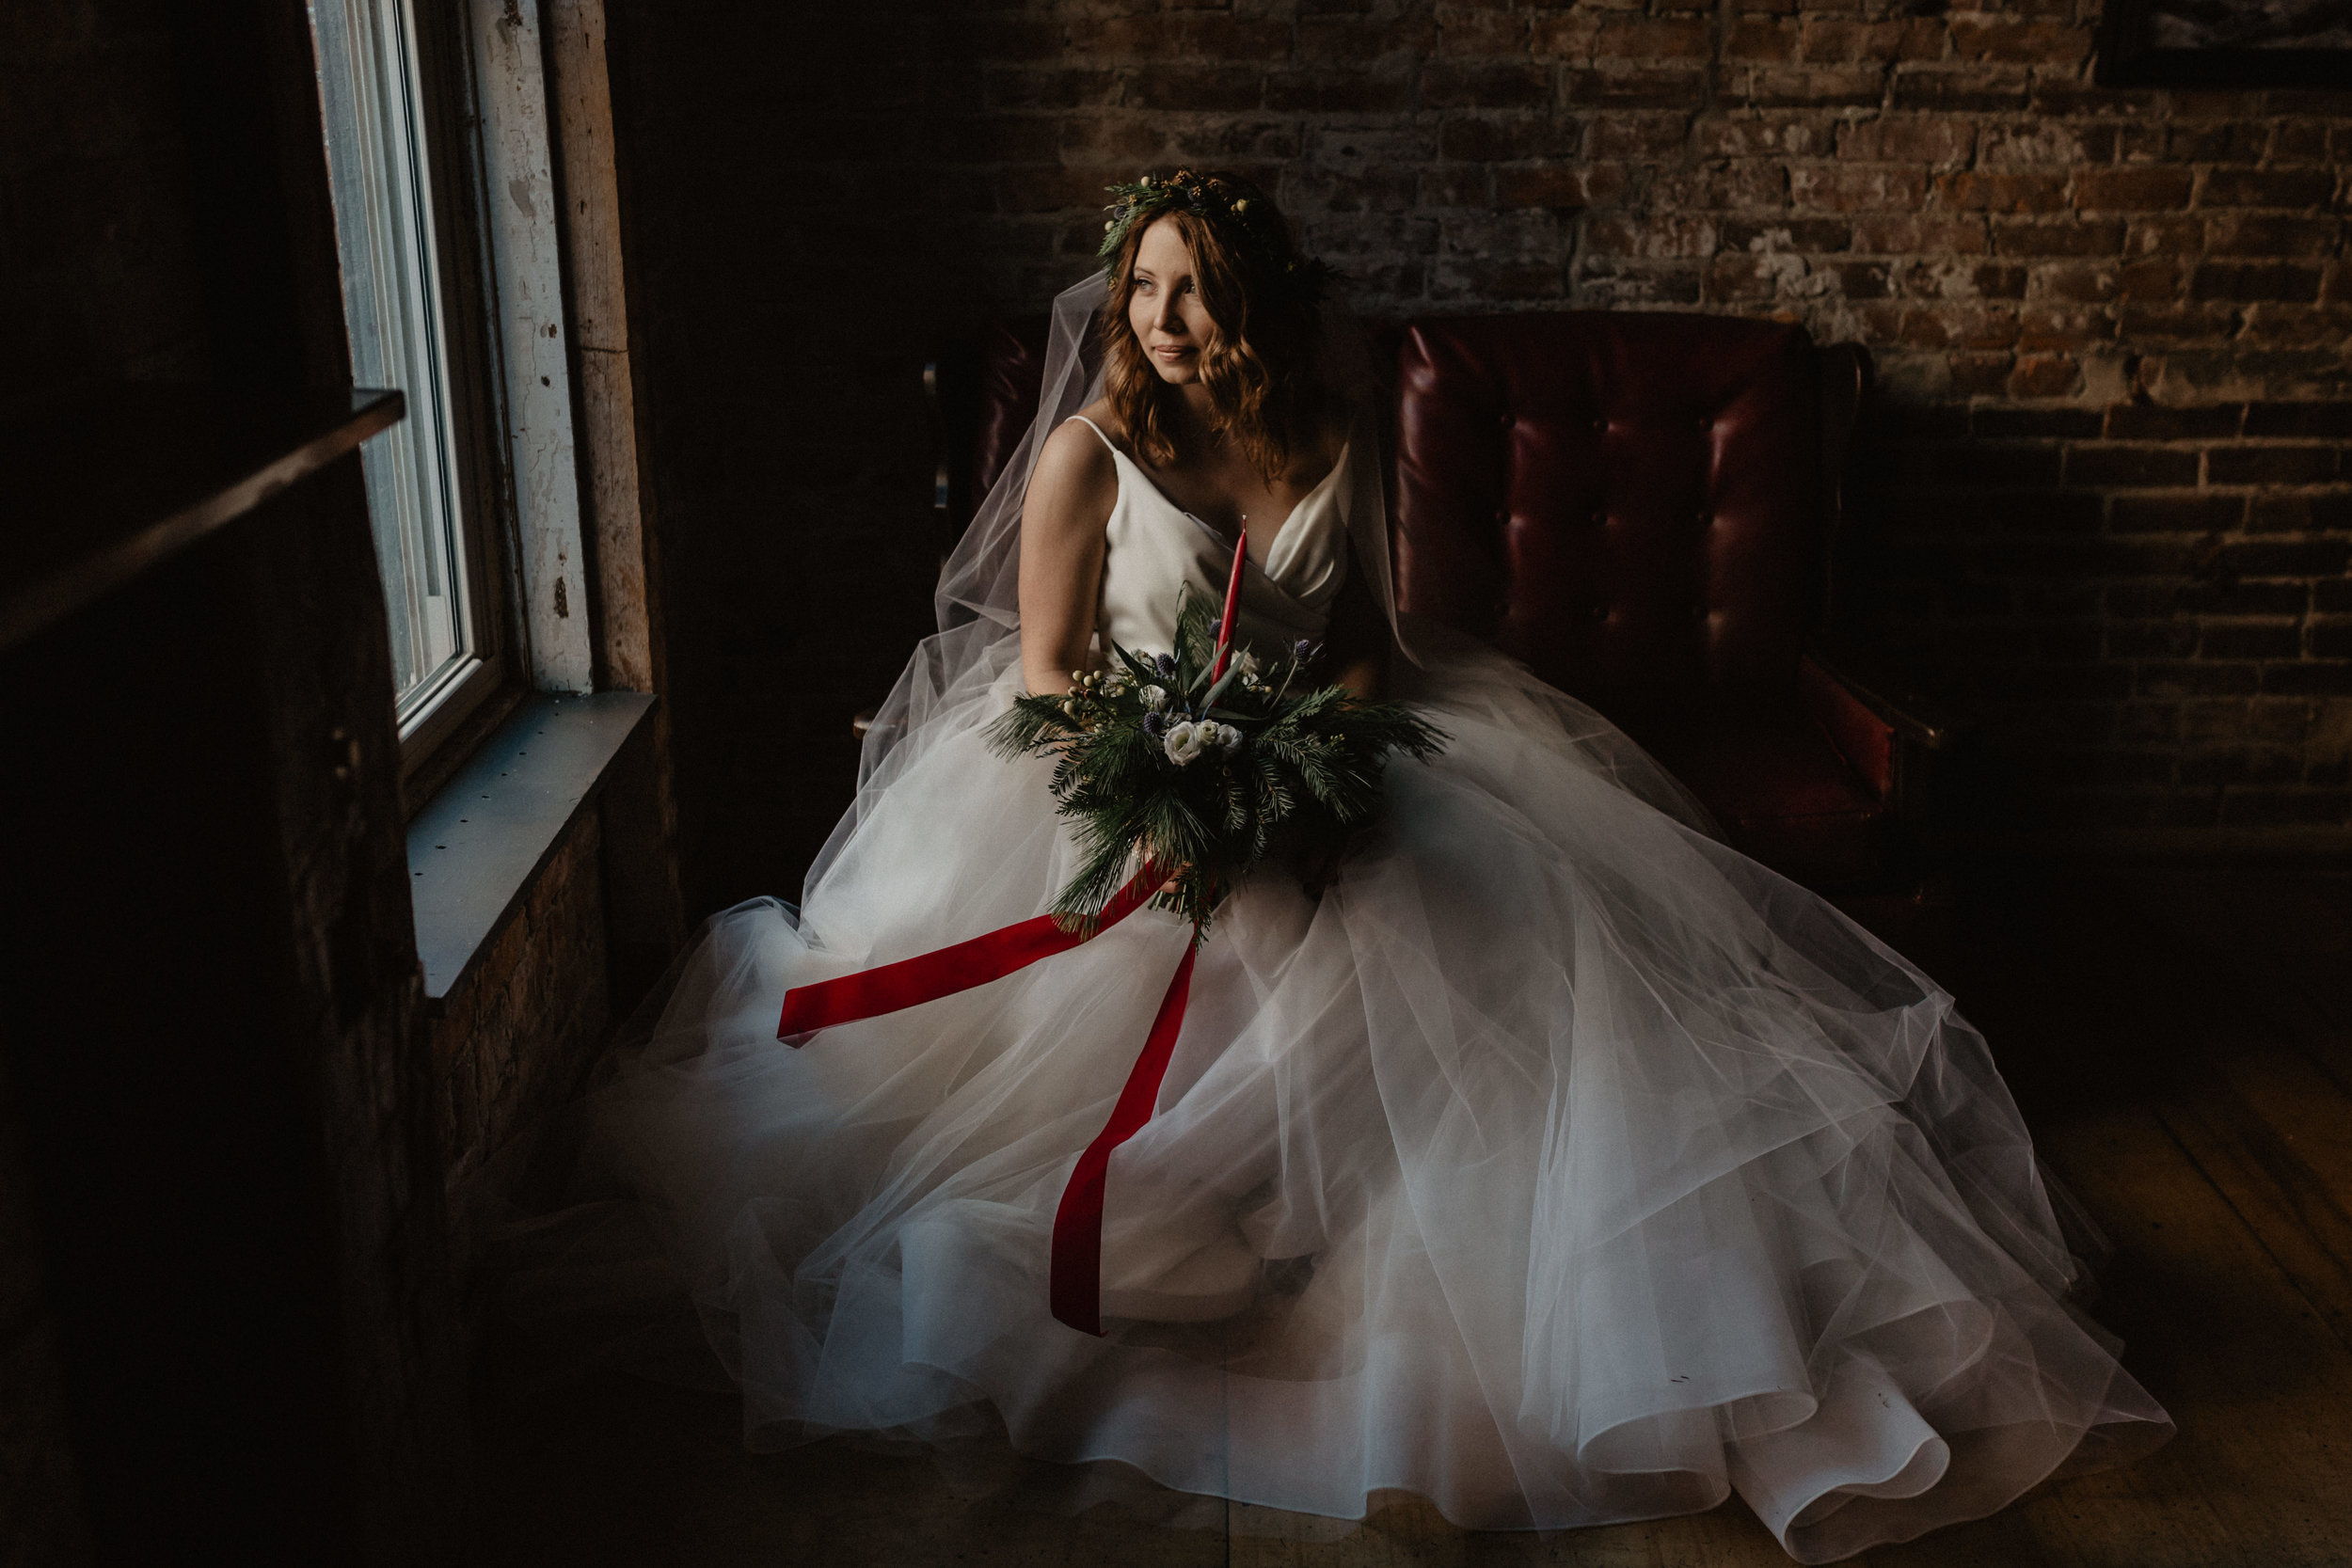 lucas_confectionery_wedding-33.jpg